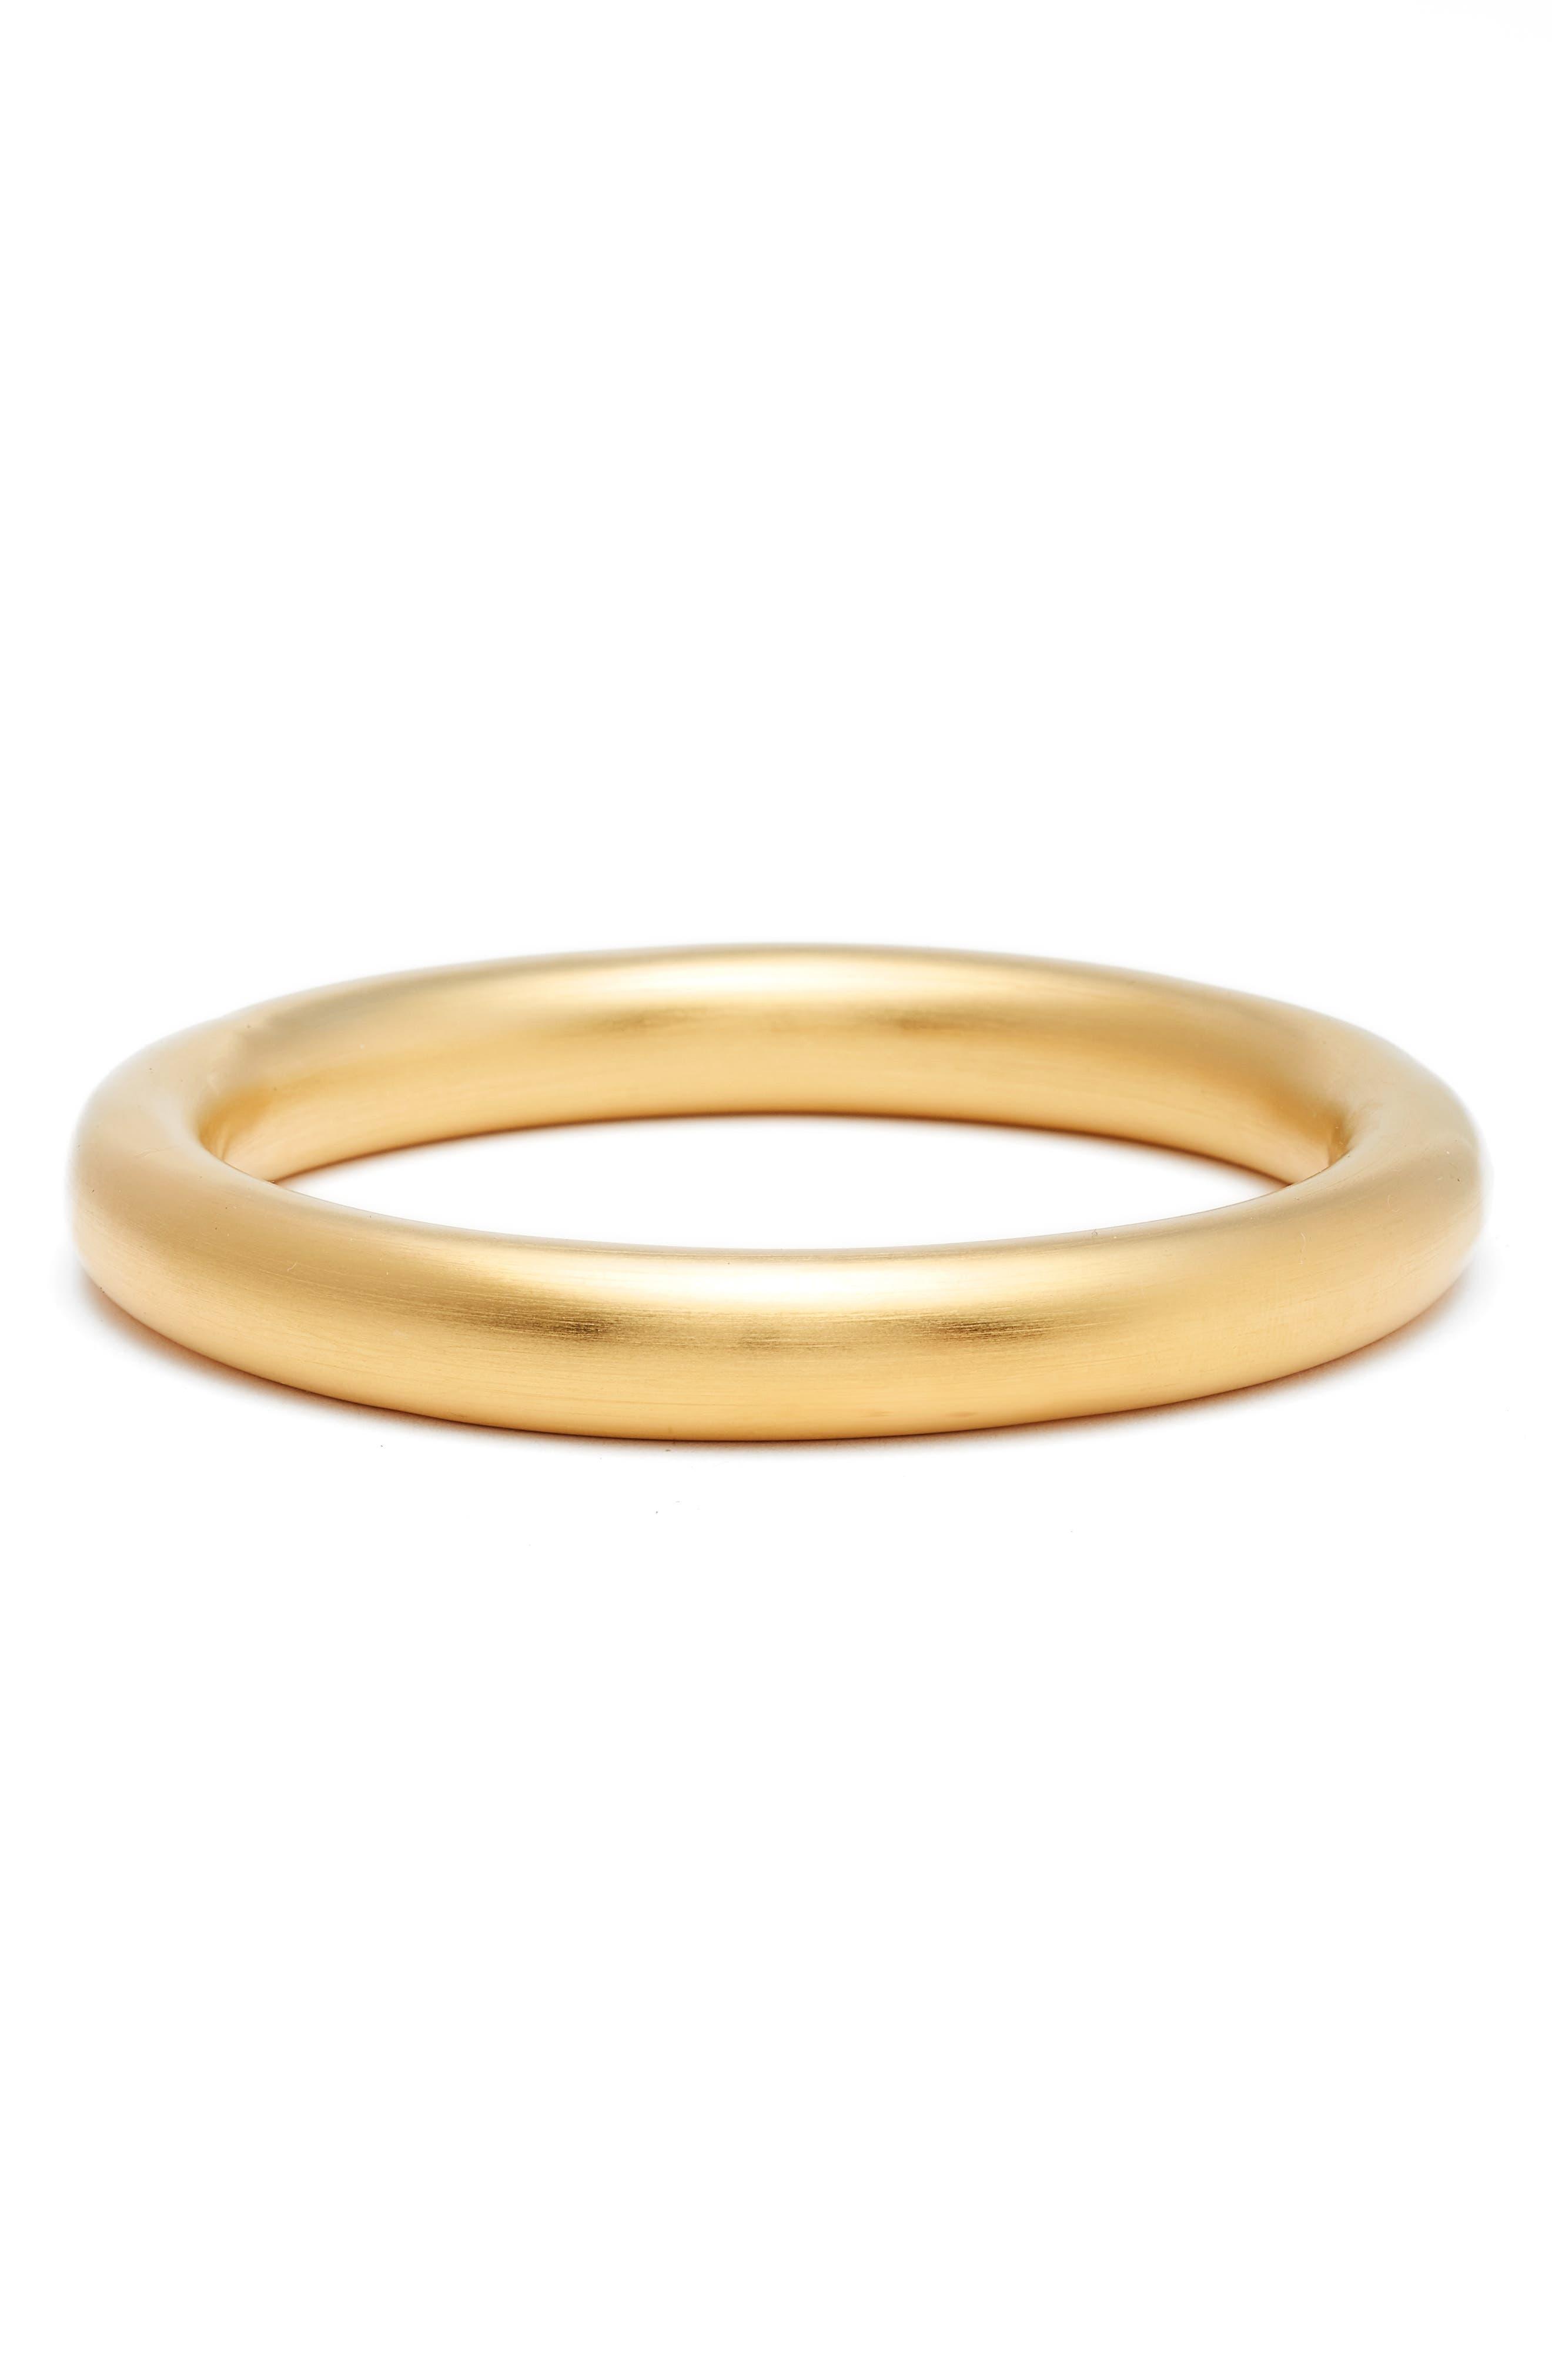 Ipanema Tubular Bangle Bracelet,                         Main,                         color, GOLD